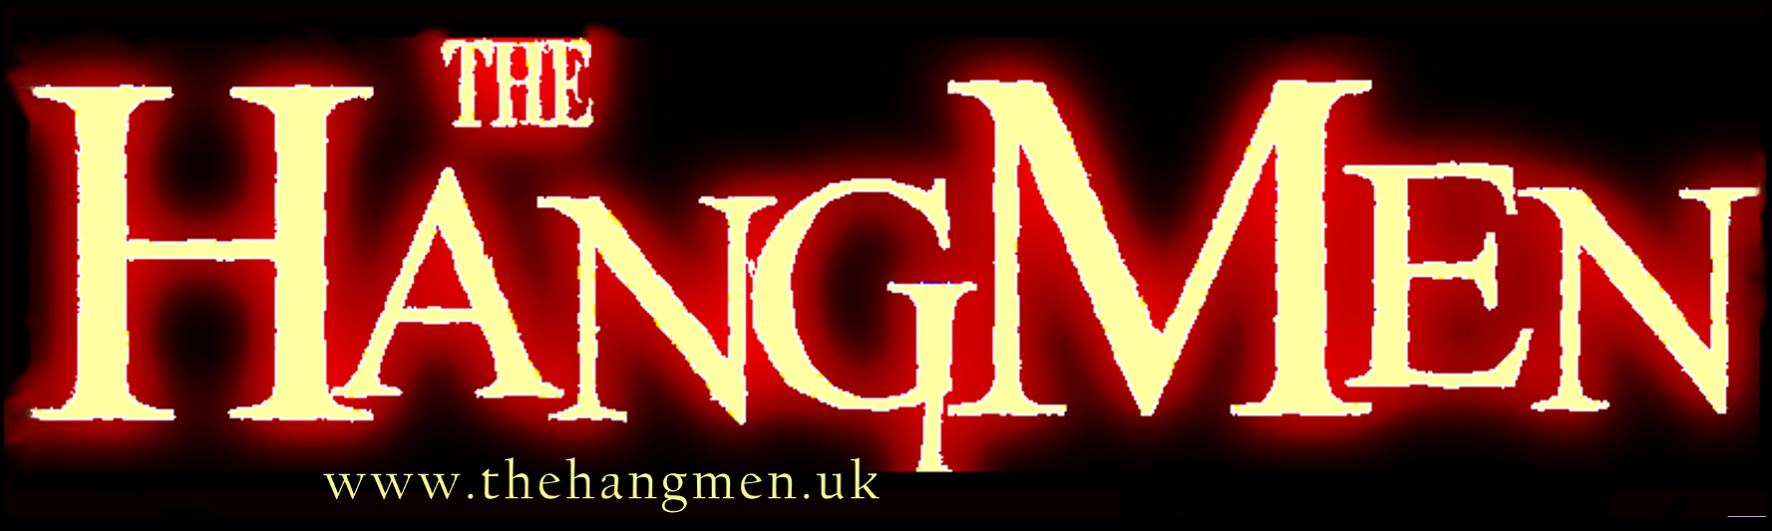 Sticker - The Hangmen Logo - The Hangmen